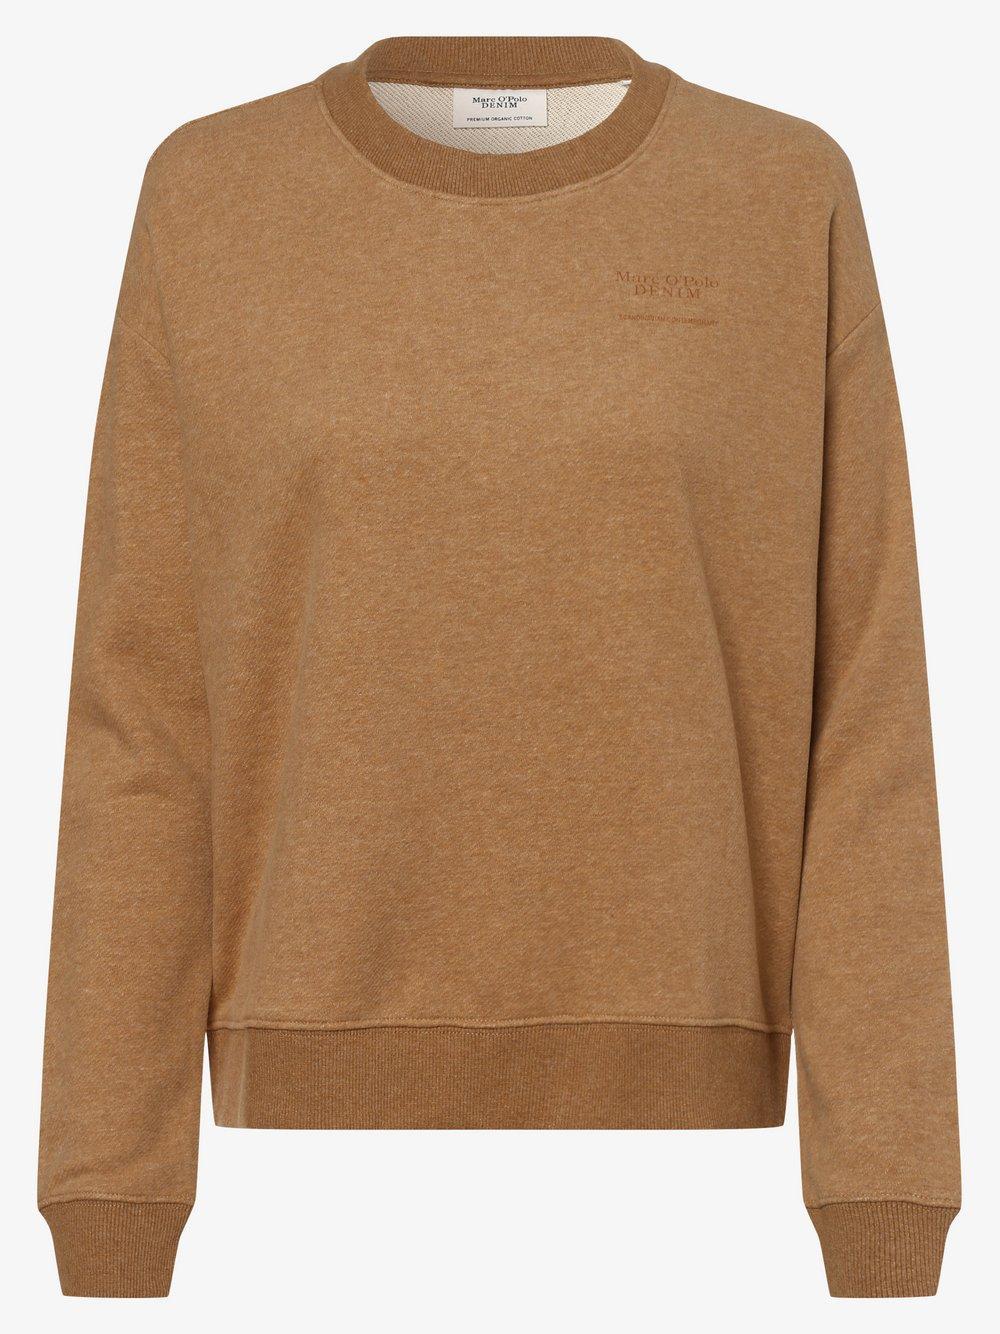 Marc O'Polo Denim - Damska bluza nierozpinana, beżowy